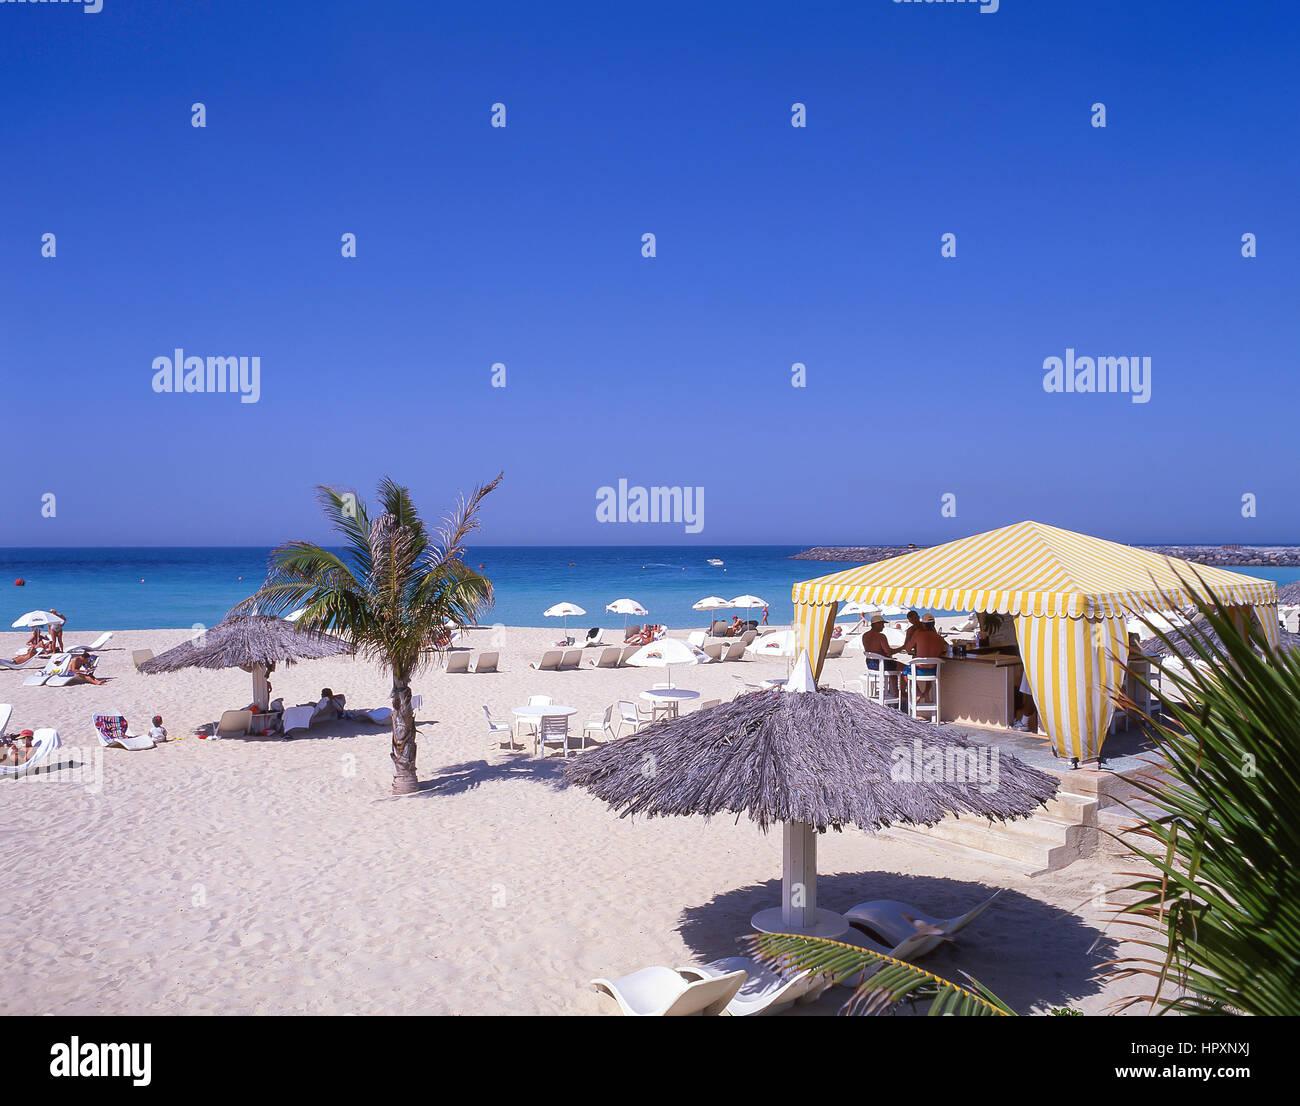 La plage de Jumeirah, Jumeirah, Dubai, Émirats Arabes Unis Photo Stock